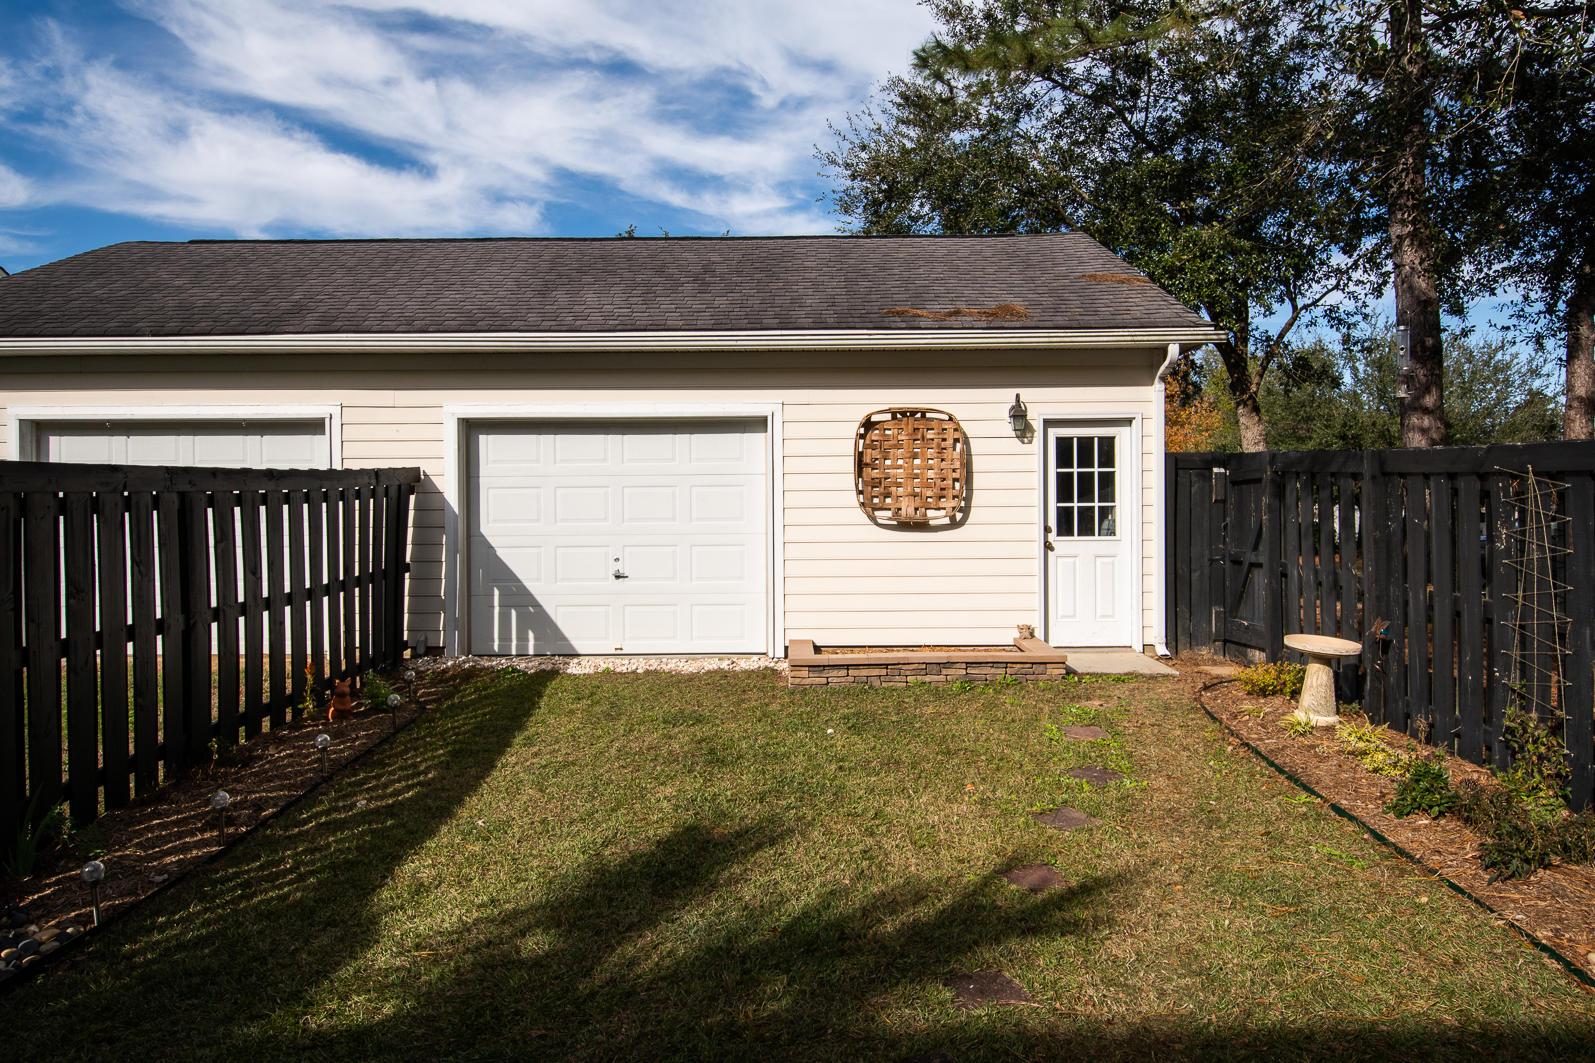 Barfield Park Homes For Sale - 1941 Pierce, Charleston, SC - 33